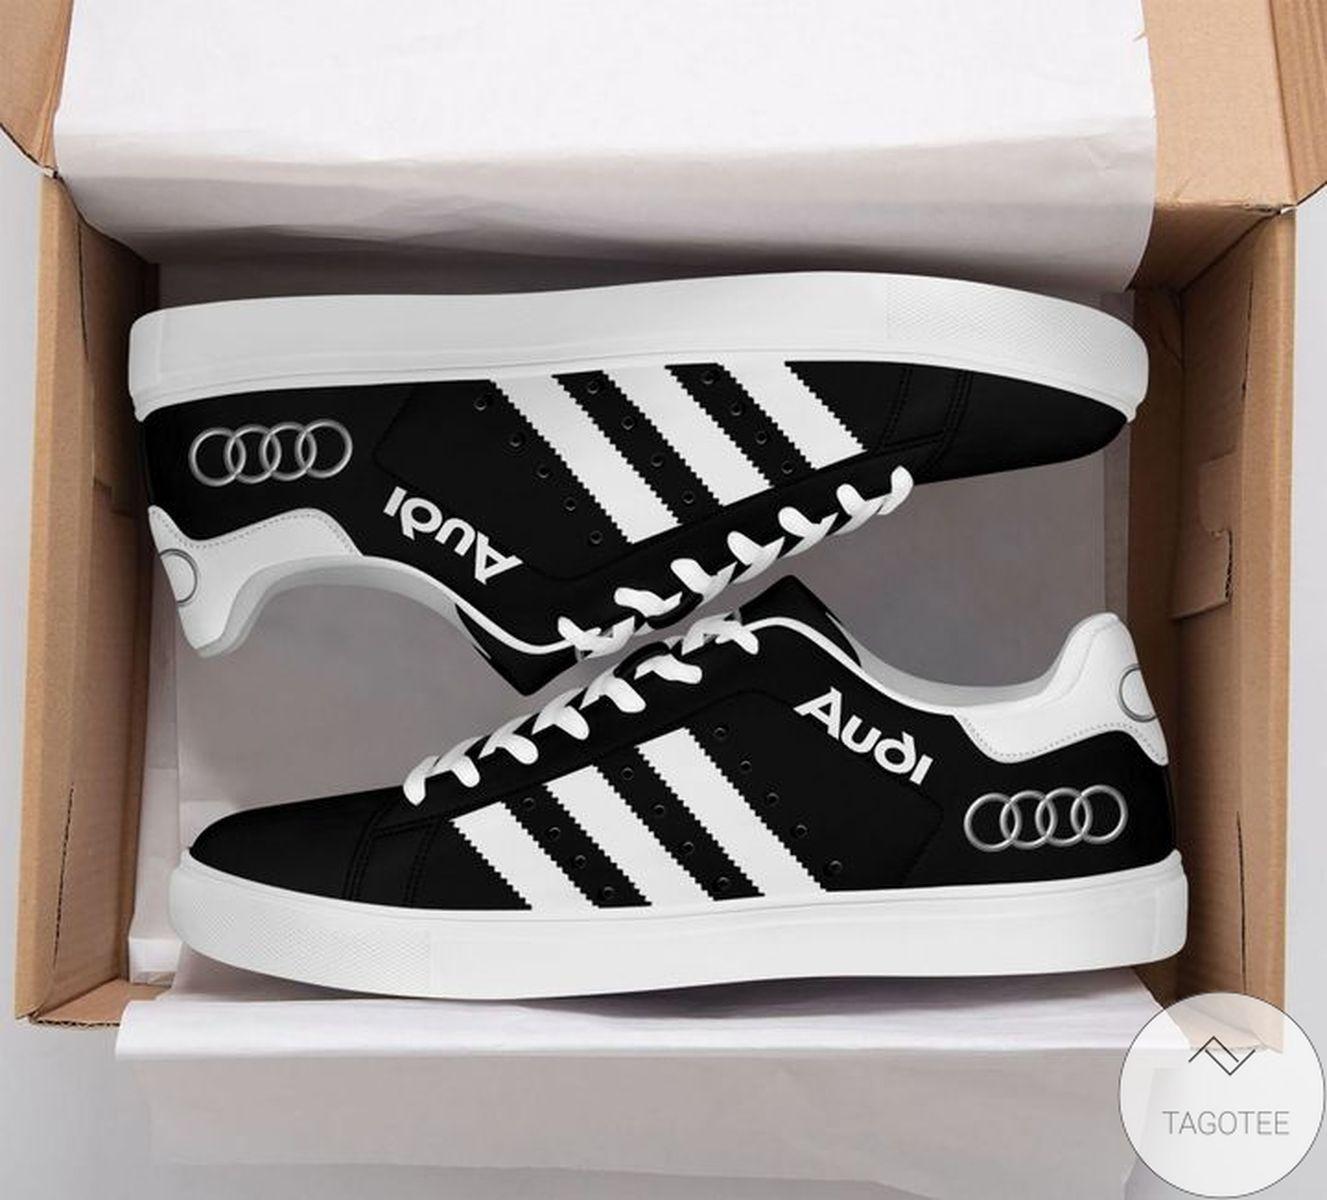 Sale Off Audi Black Stan Smith Shoes